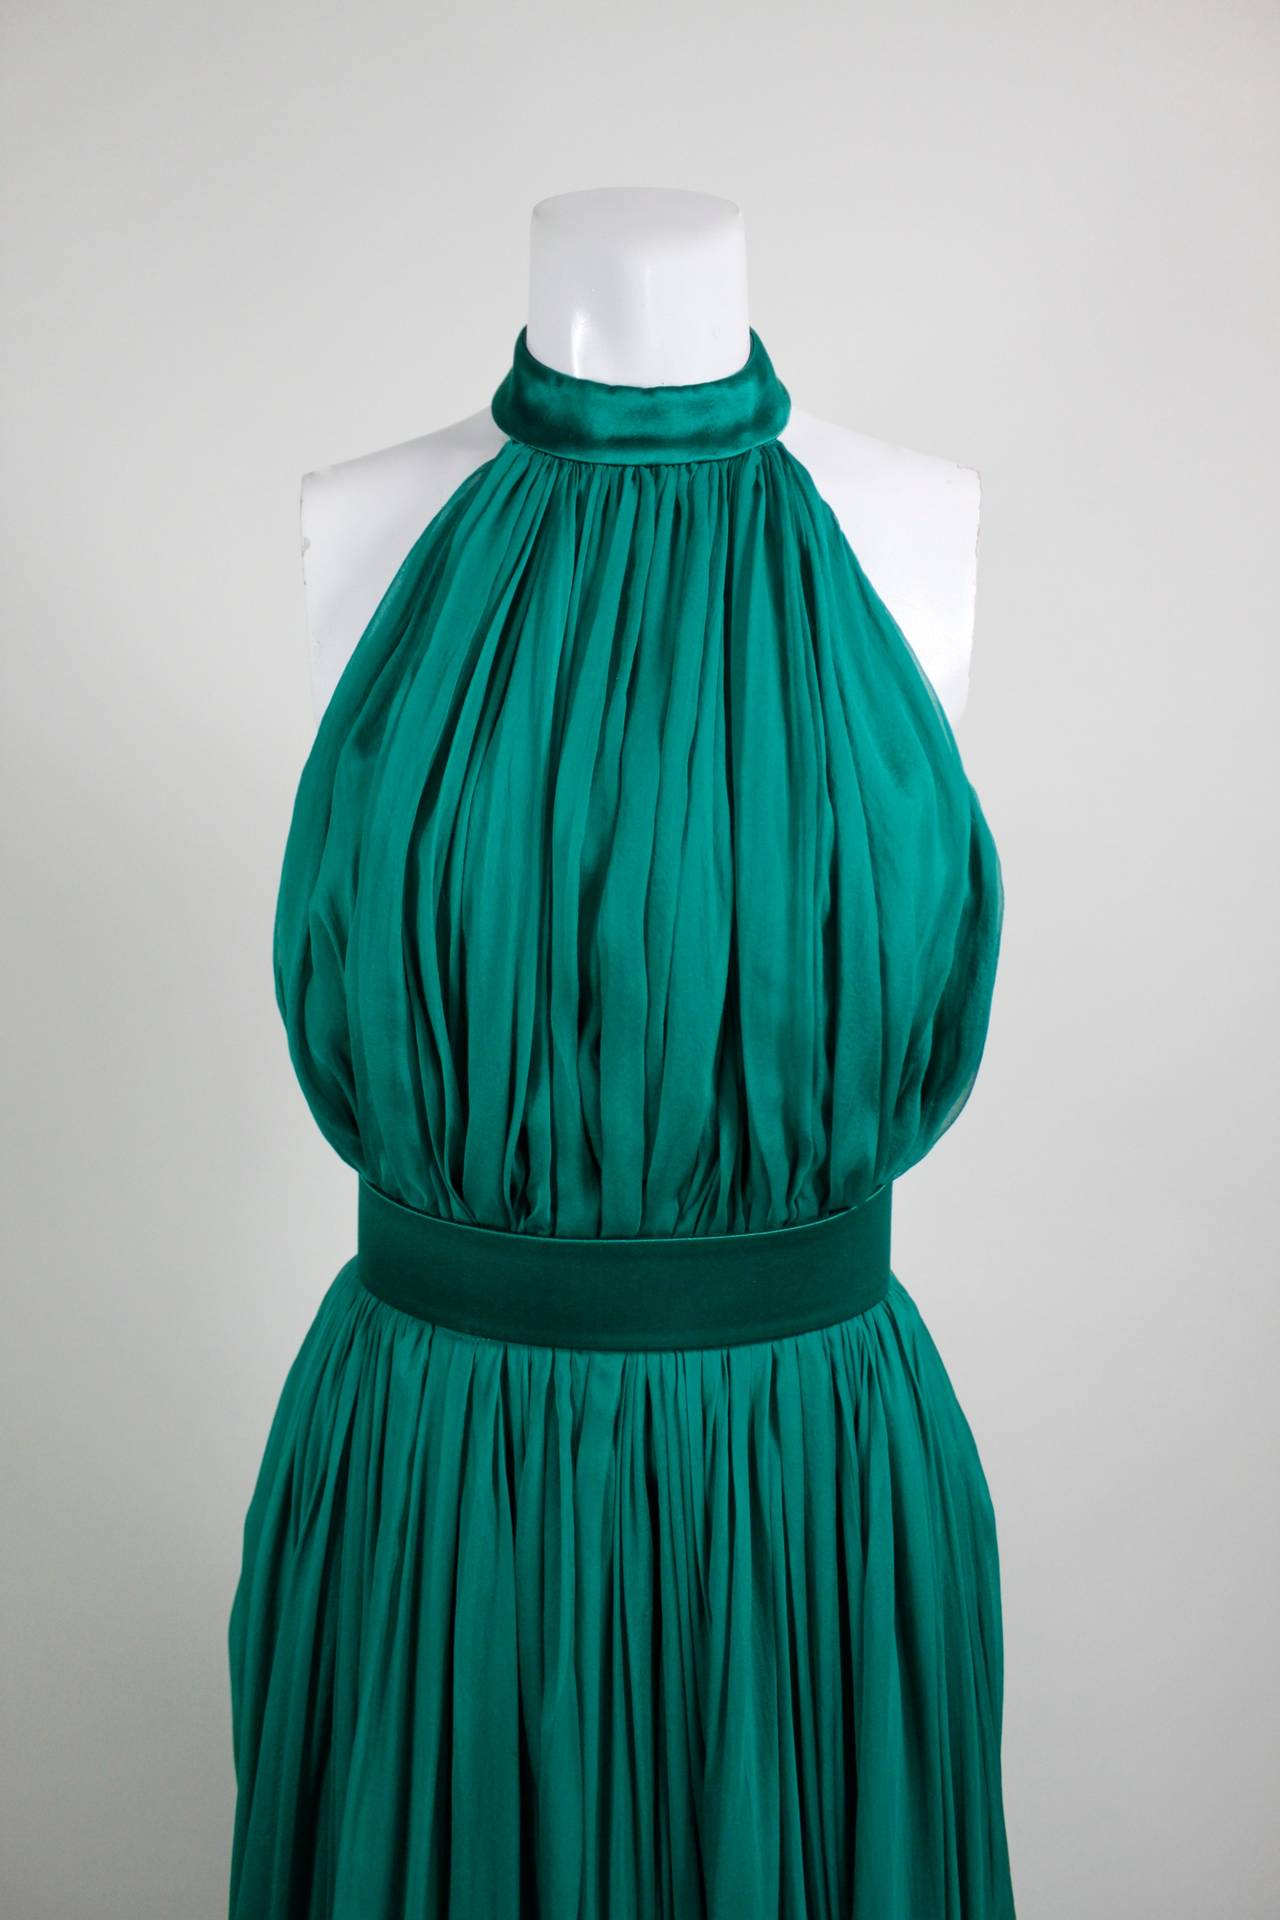 Alexander McQueen 2010 Flowing Emerald Green Chiffon Halter Gown with Belt 2